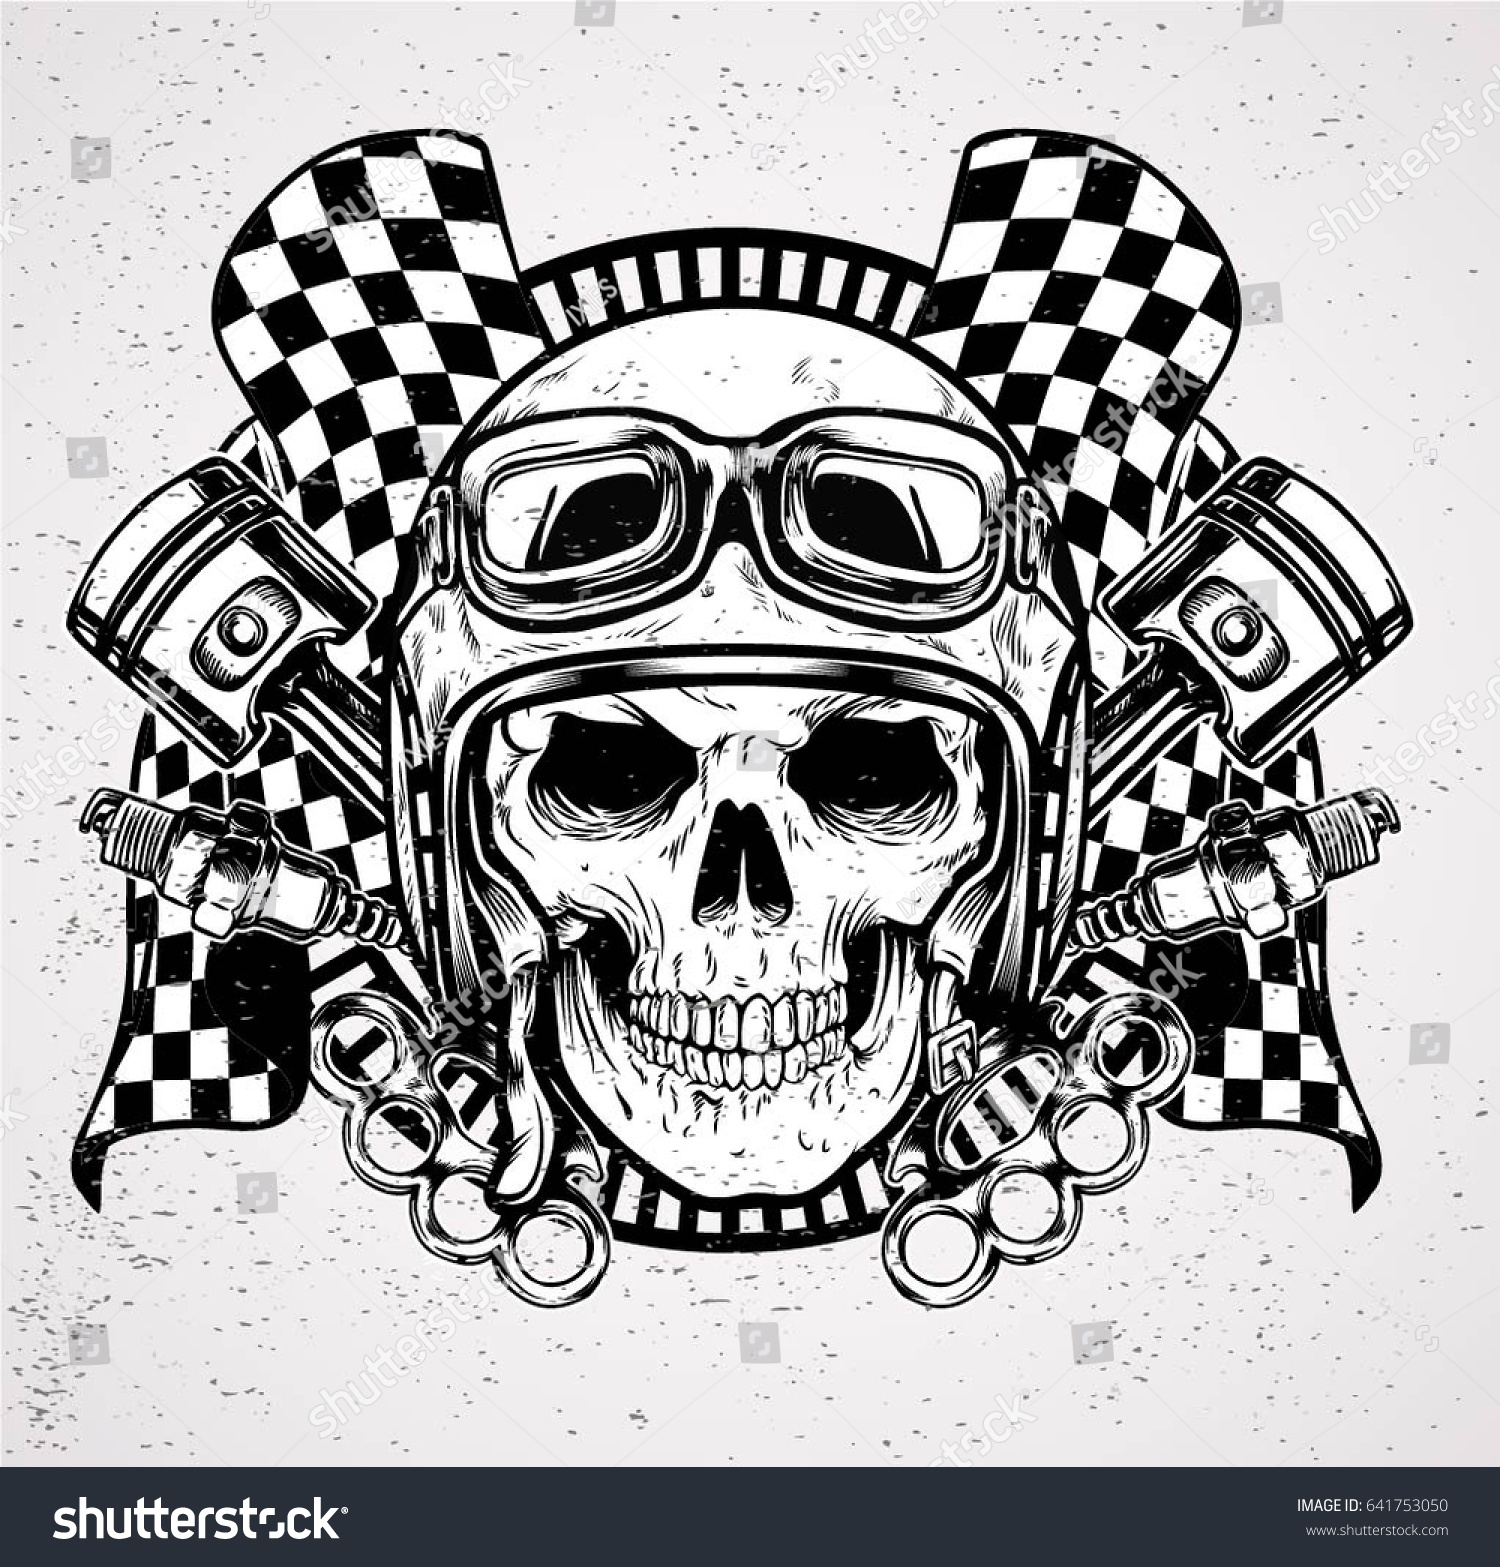 Head Skull Wearing Helmet Cafe Racer Stock Vector (Royalty Free ... 9951acfe1cf1